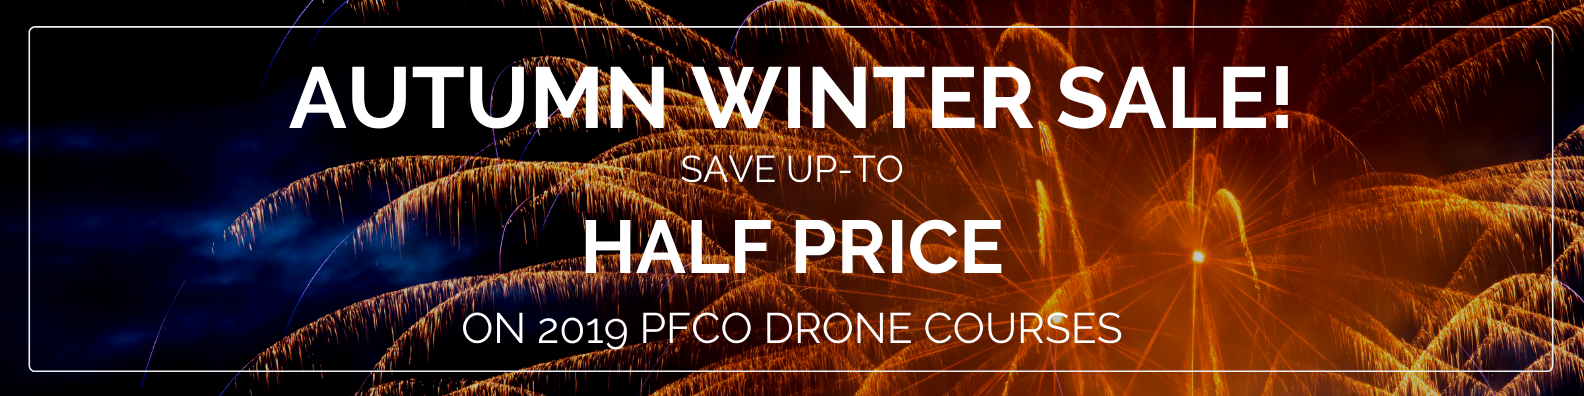 drone course half price sale